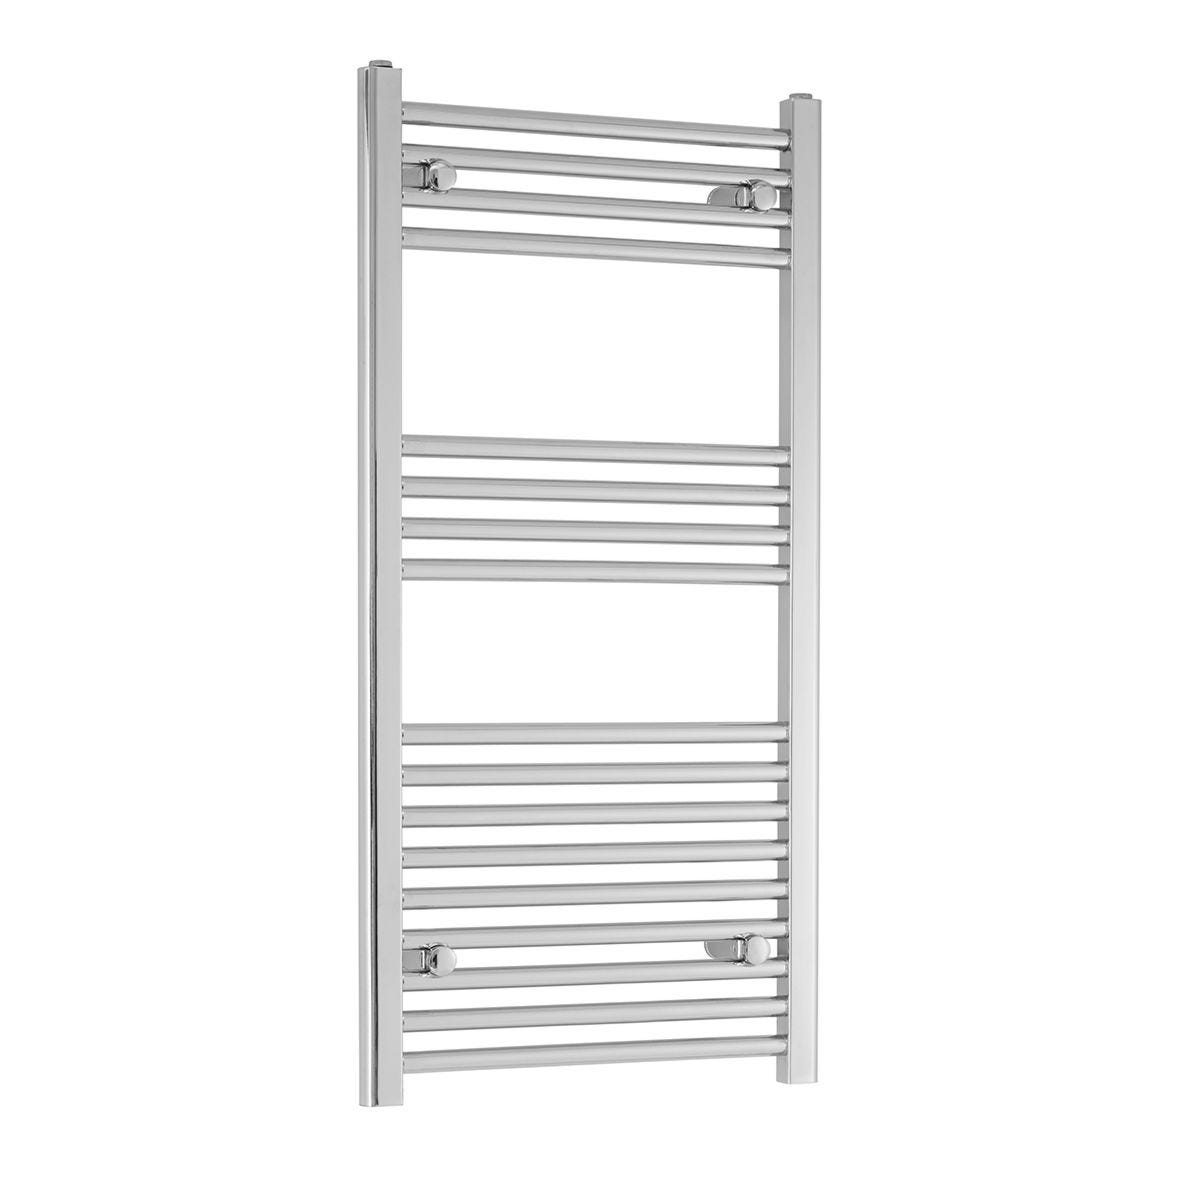 Heating Style Blythe Ladder Rail 1000x500mm Straight -Chrome